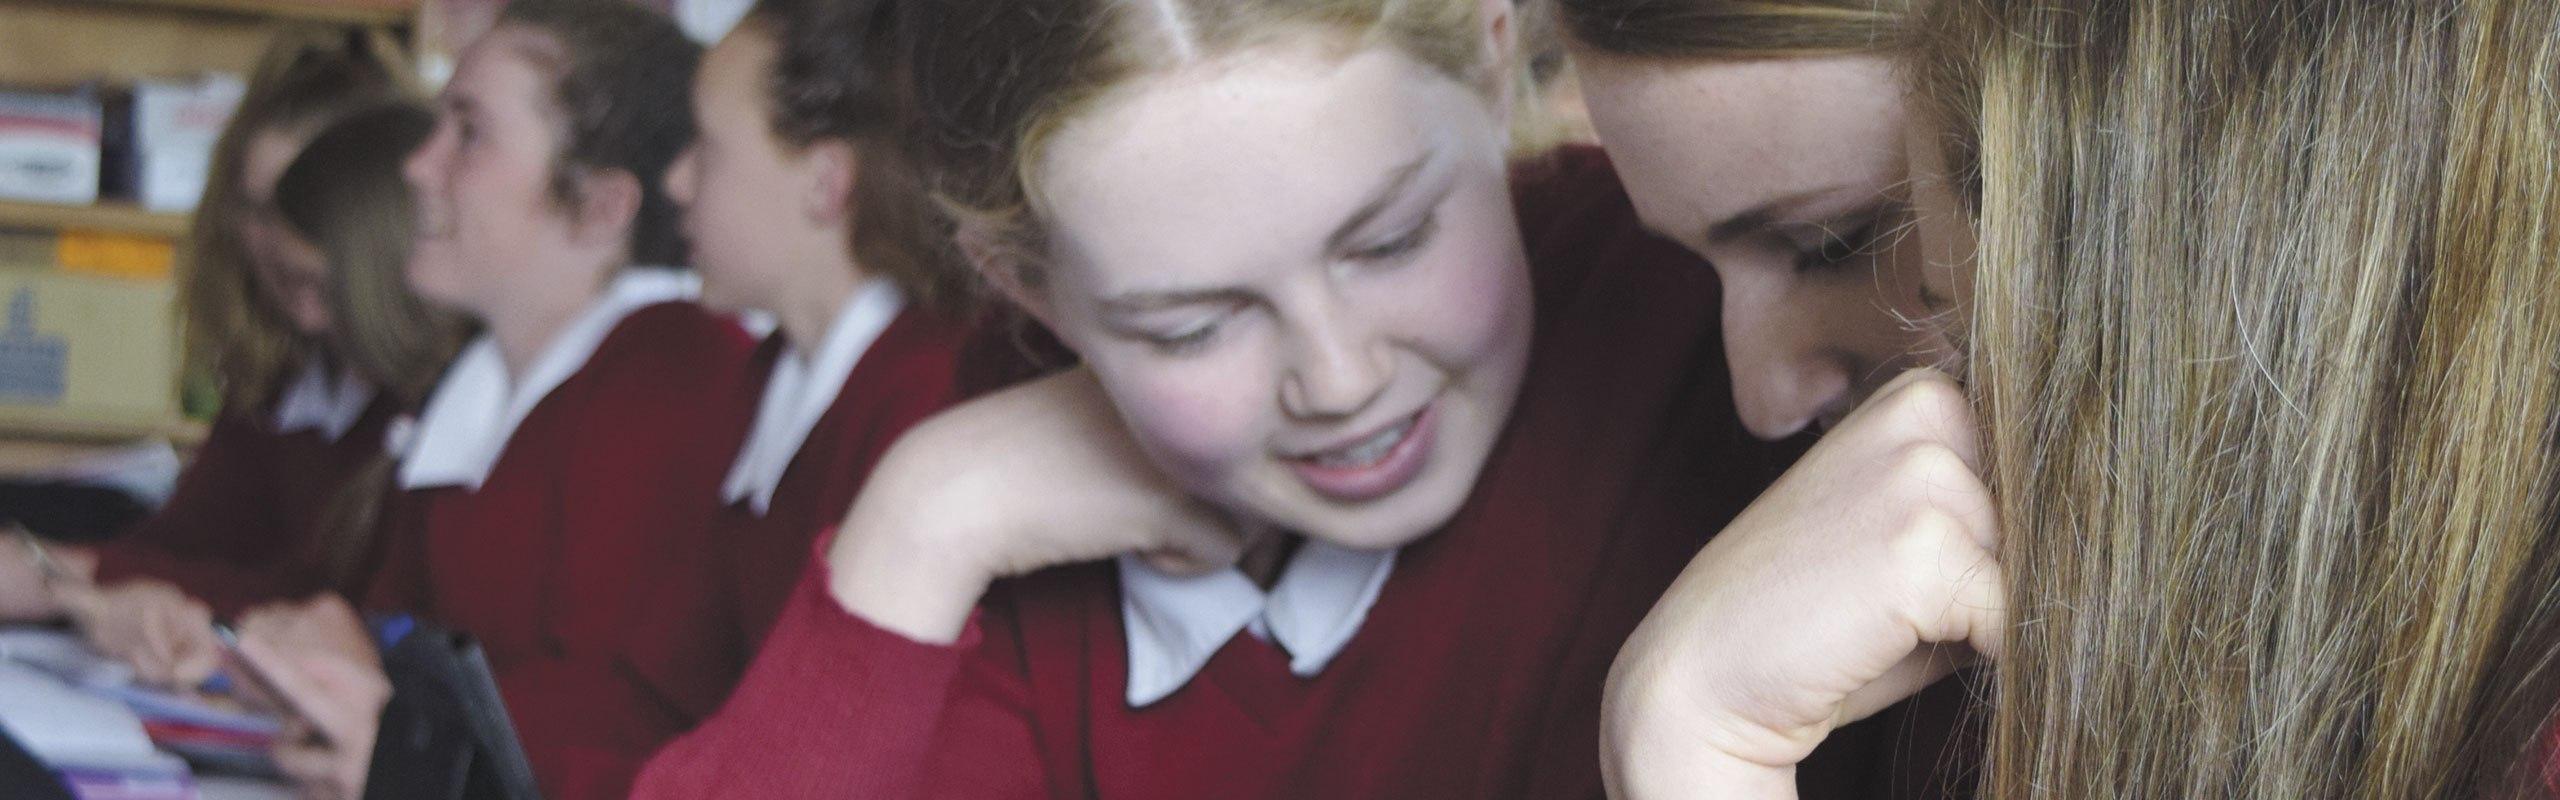 Sacred Heart Girls' College